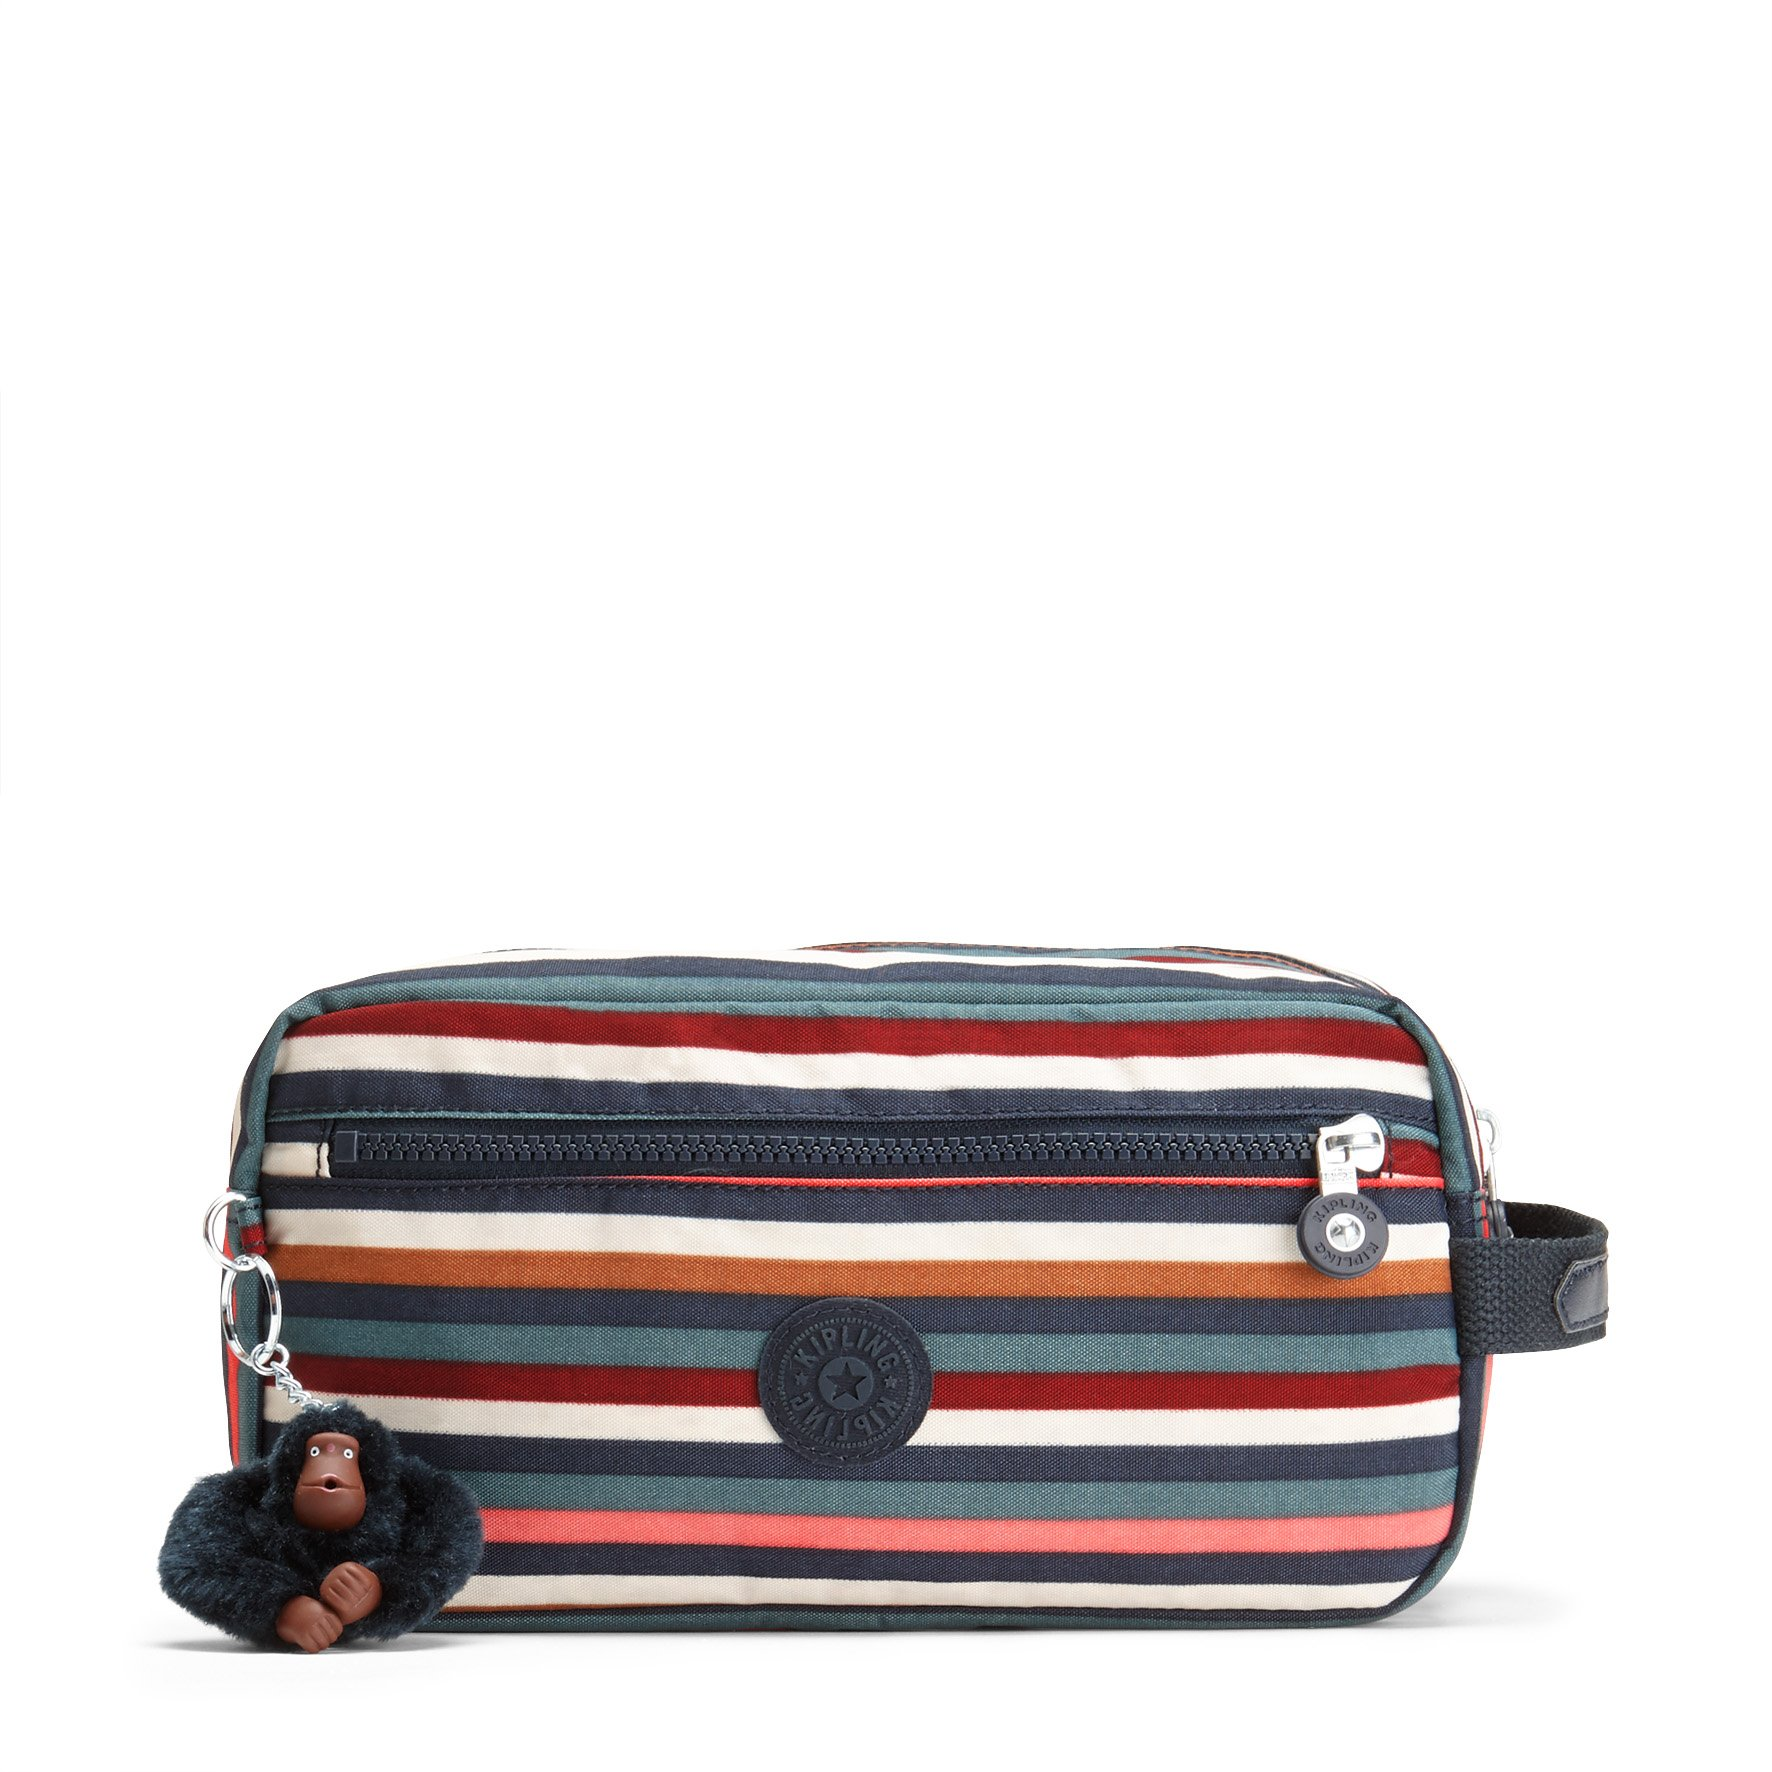 Kipling Women's Agot Multi Stripes Large Toiletry Bag by Kipling